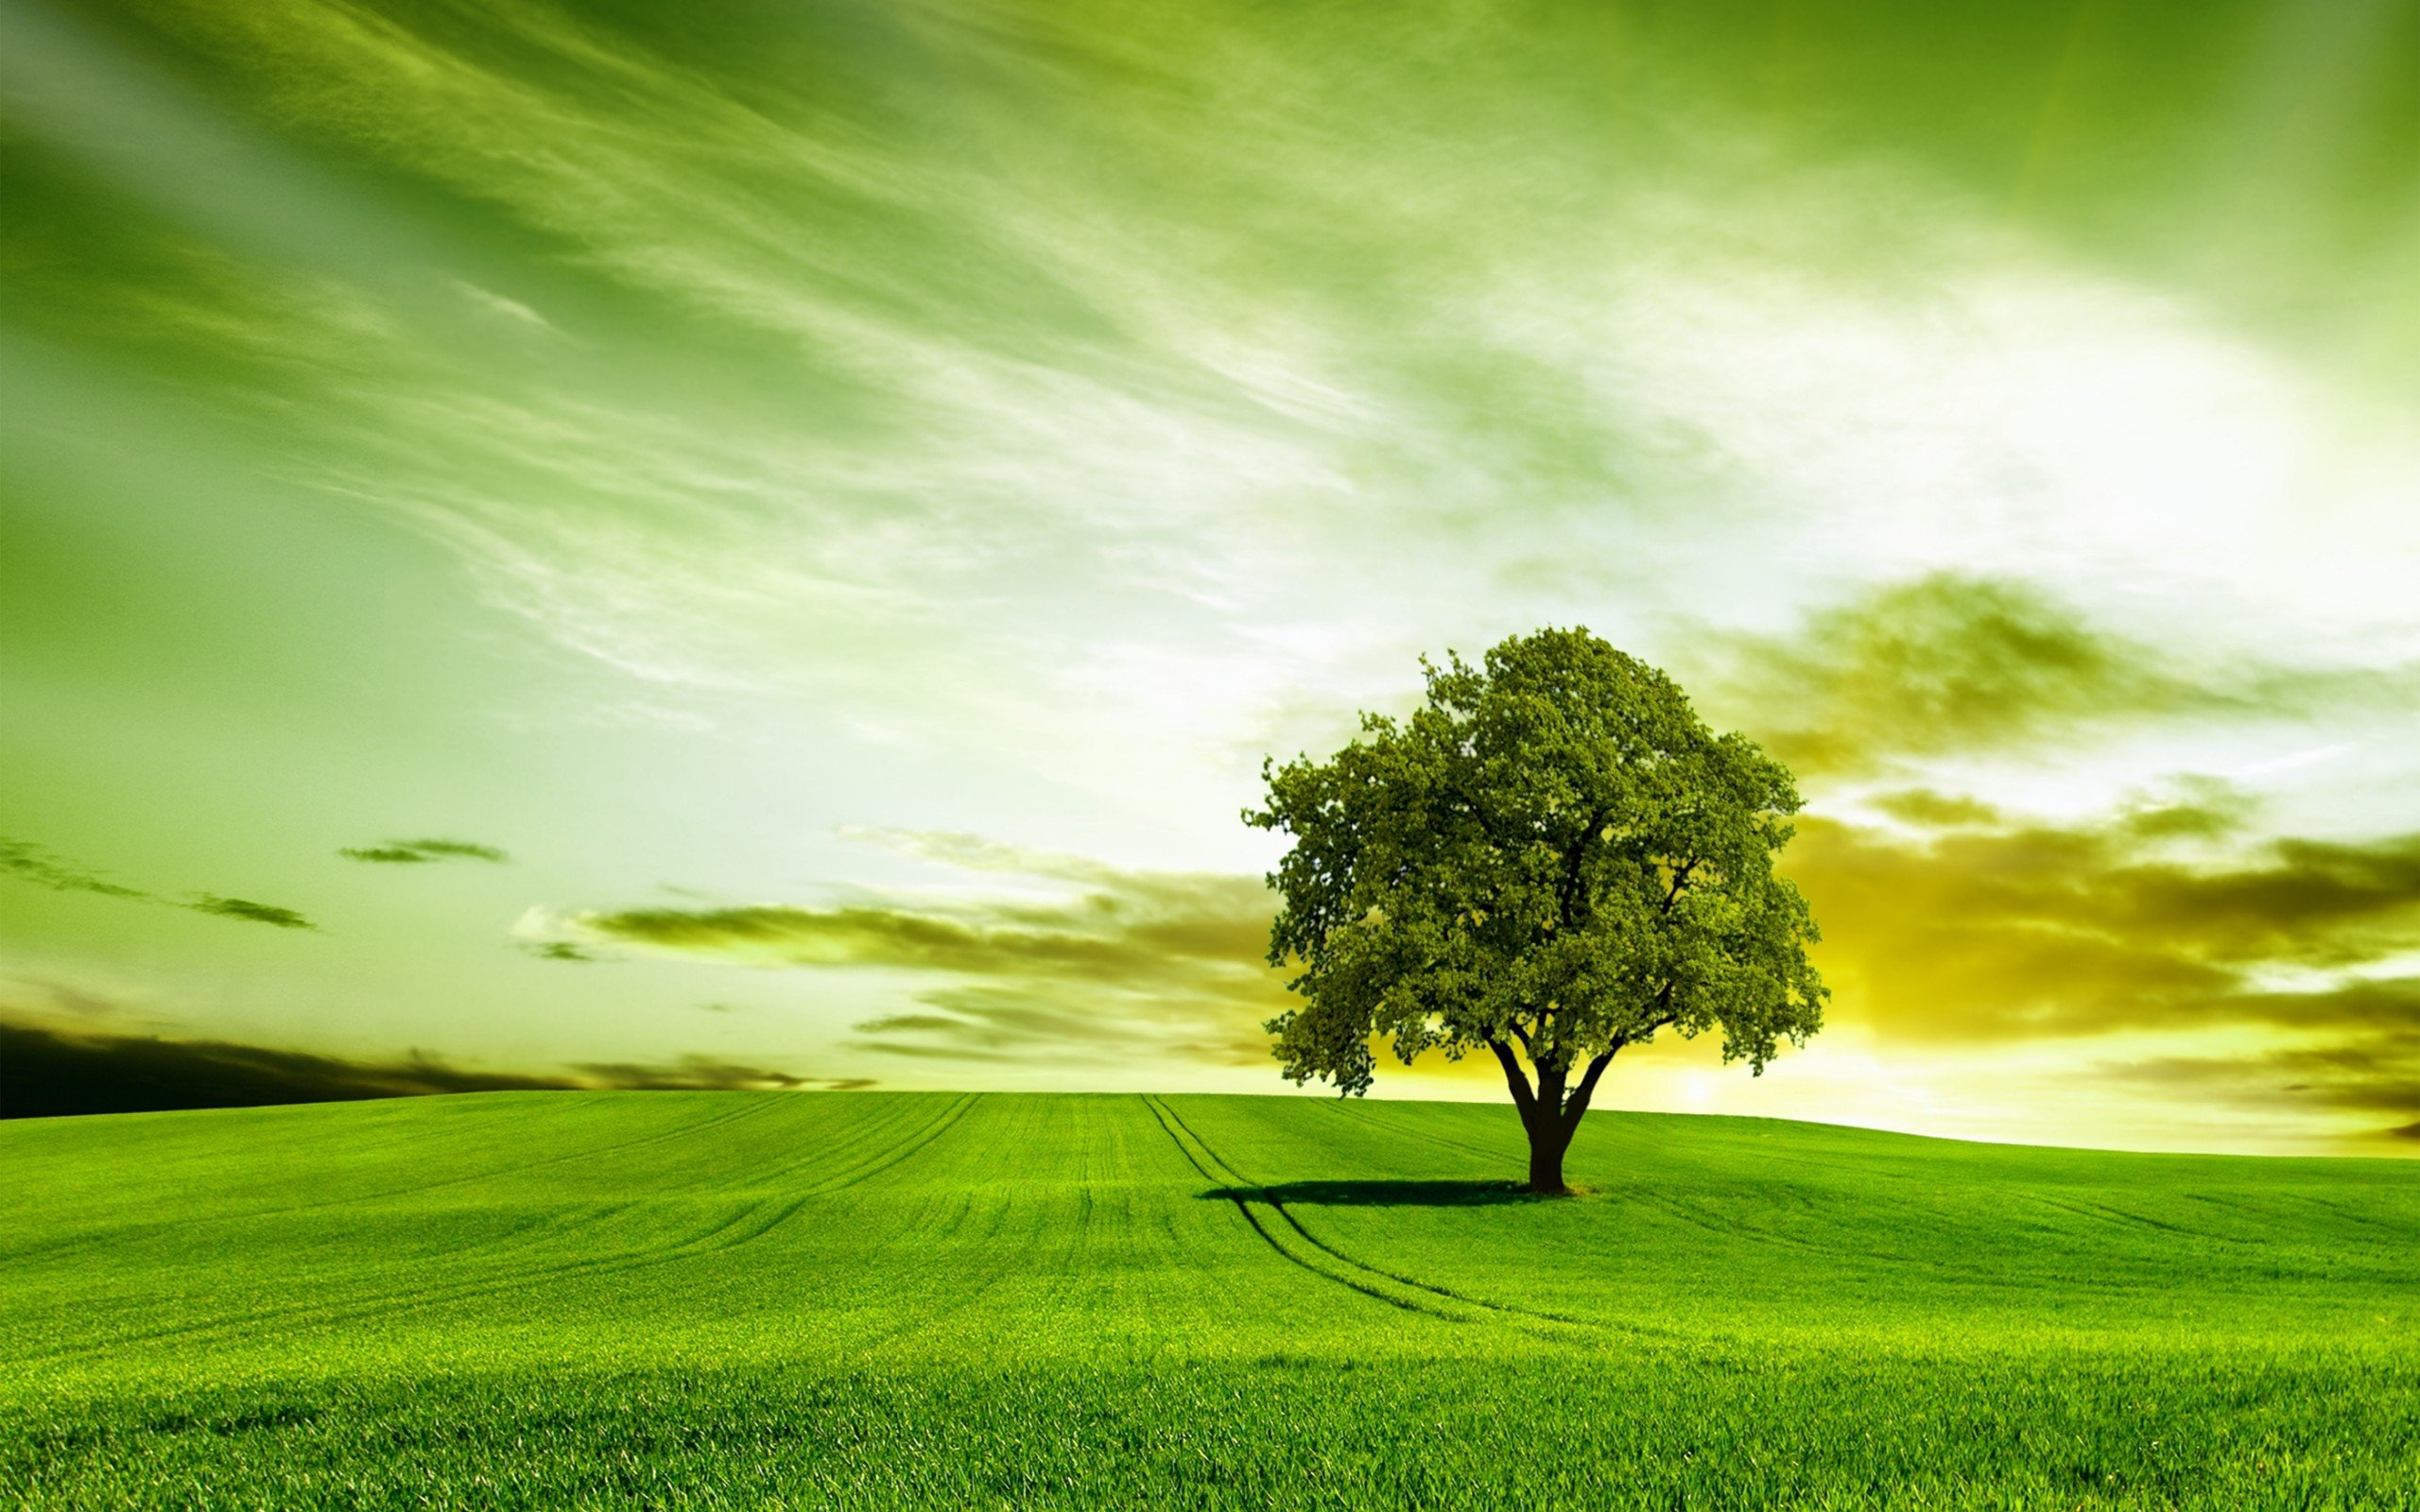 Green tree nature sky wallpaper 2560x1600 454898 - Nature wallpaper 2560x1600 ...